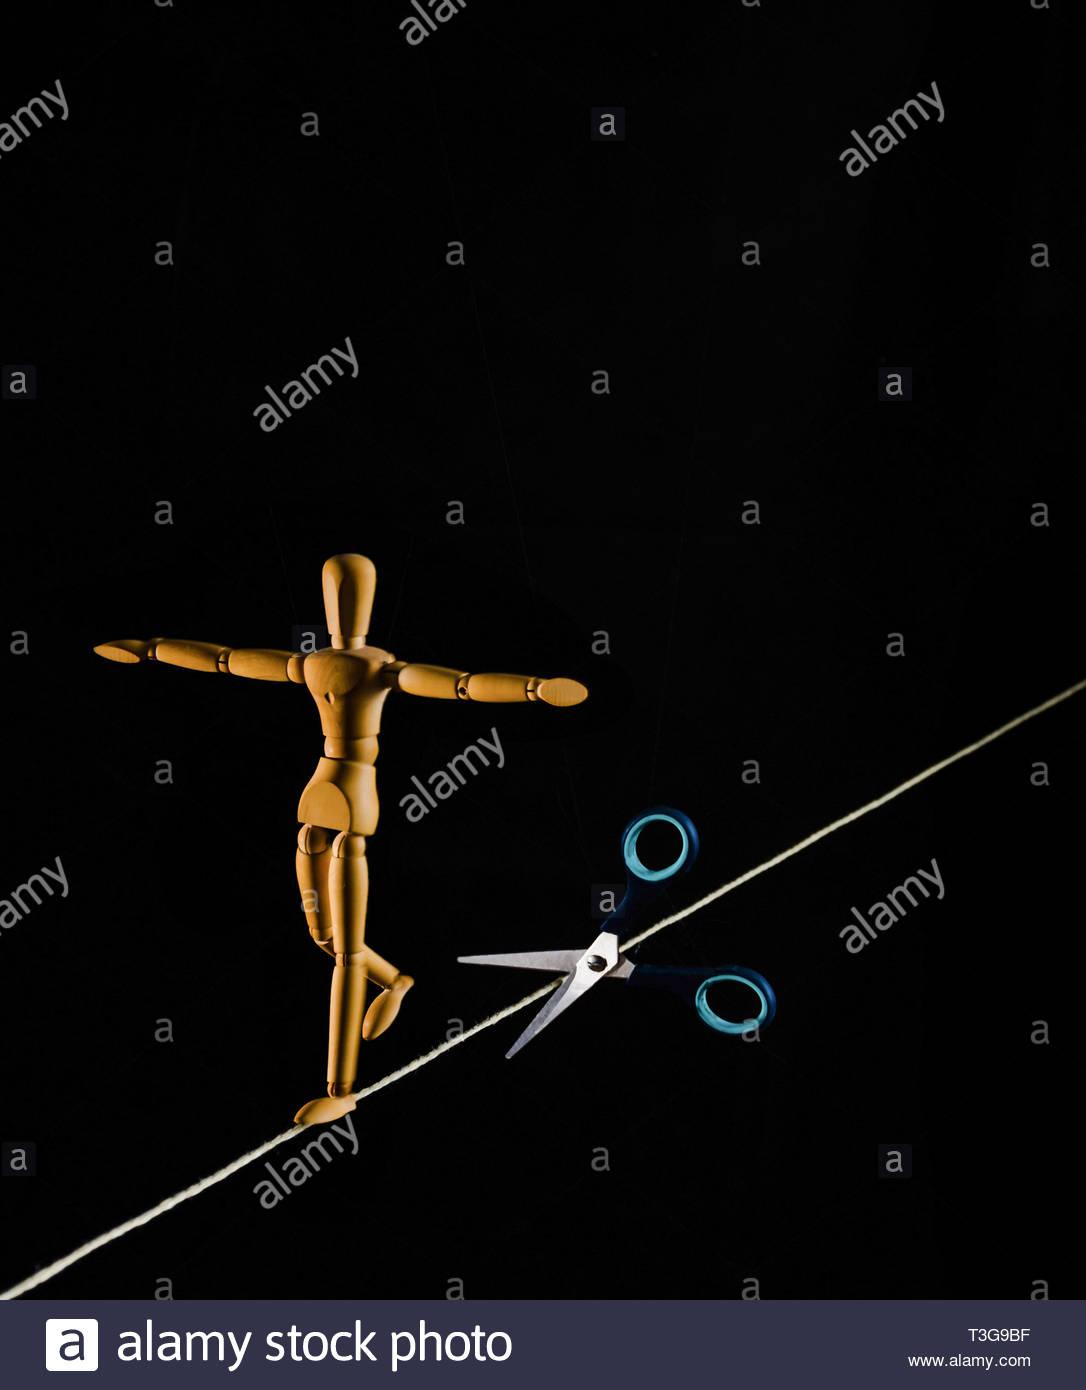 tightrope walker - Stock Image